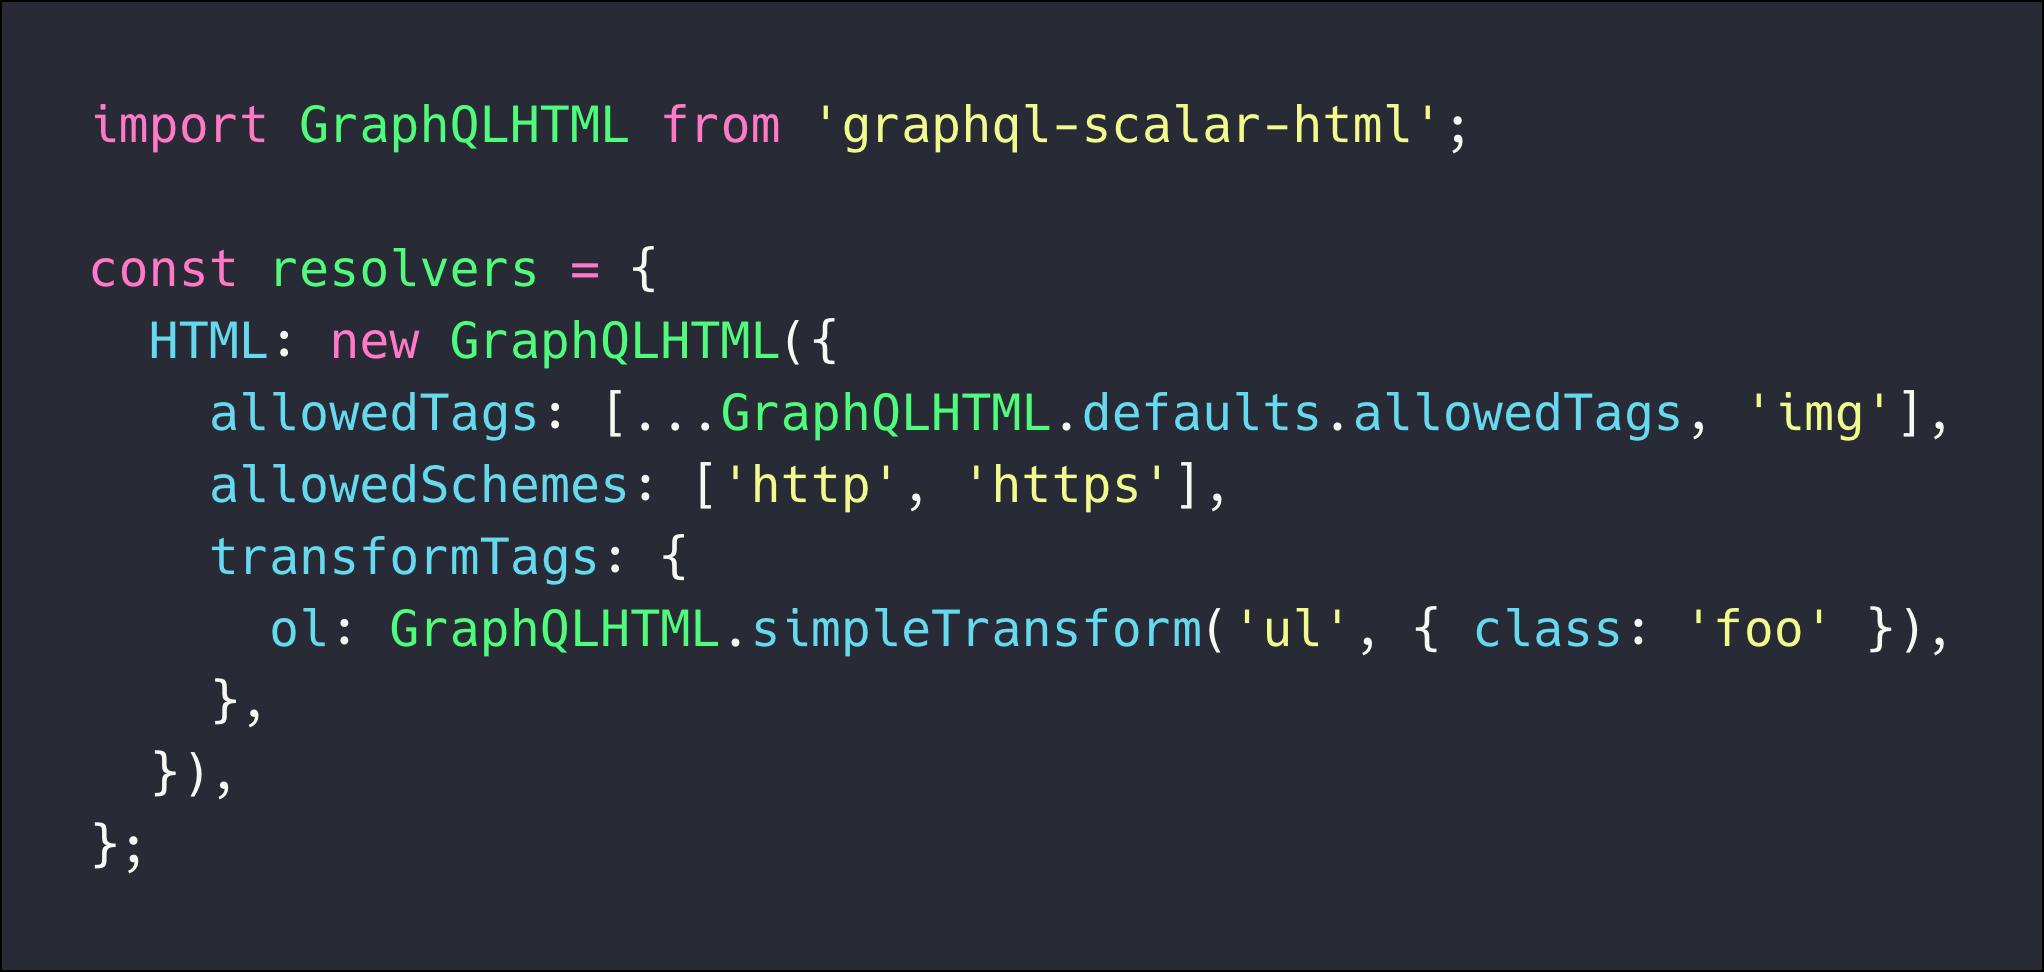 graphql-scalar-html